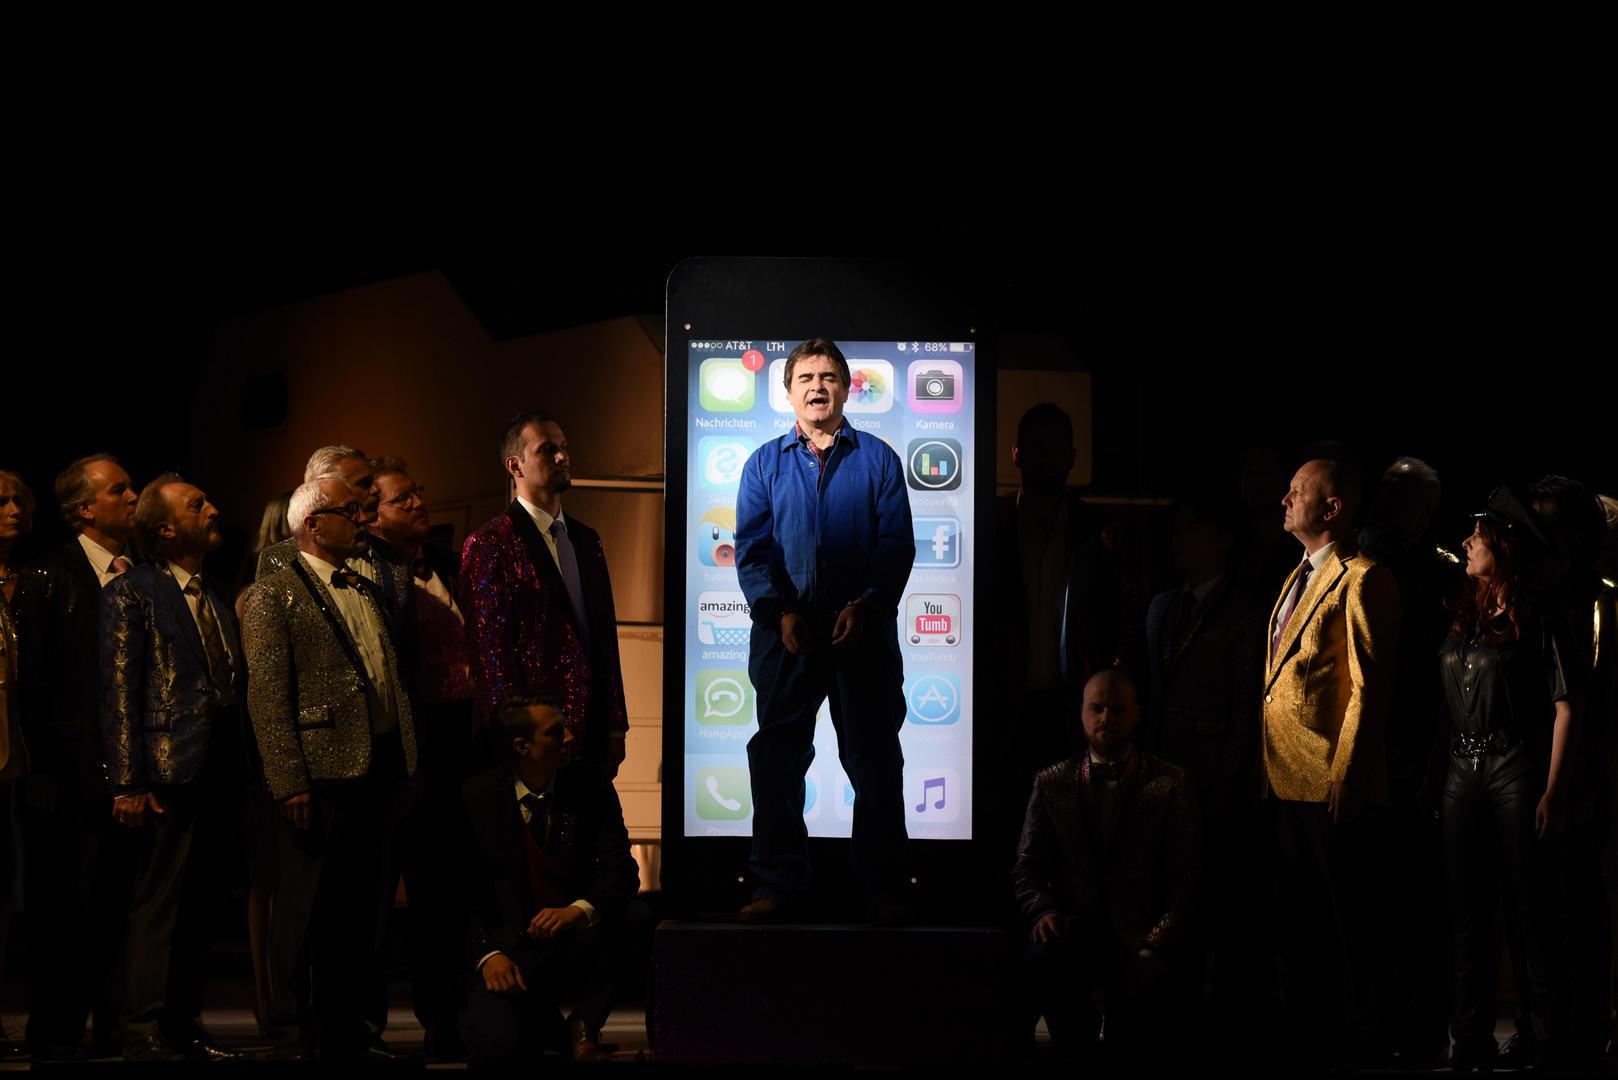 Mahagonny-Opera-by-Kurt-Weill-Stage-director-Jacopo-Spirei-Salzburg-22